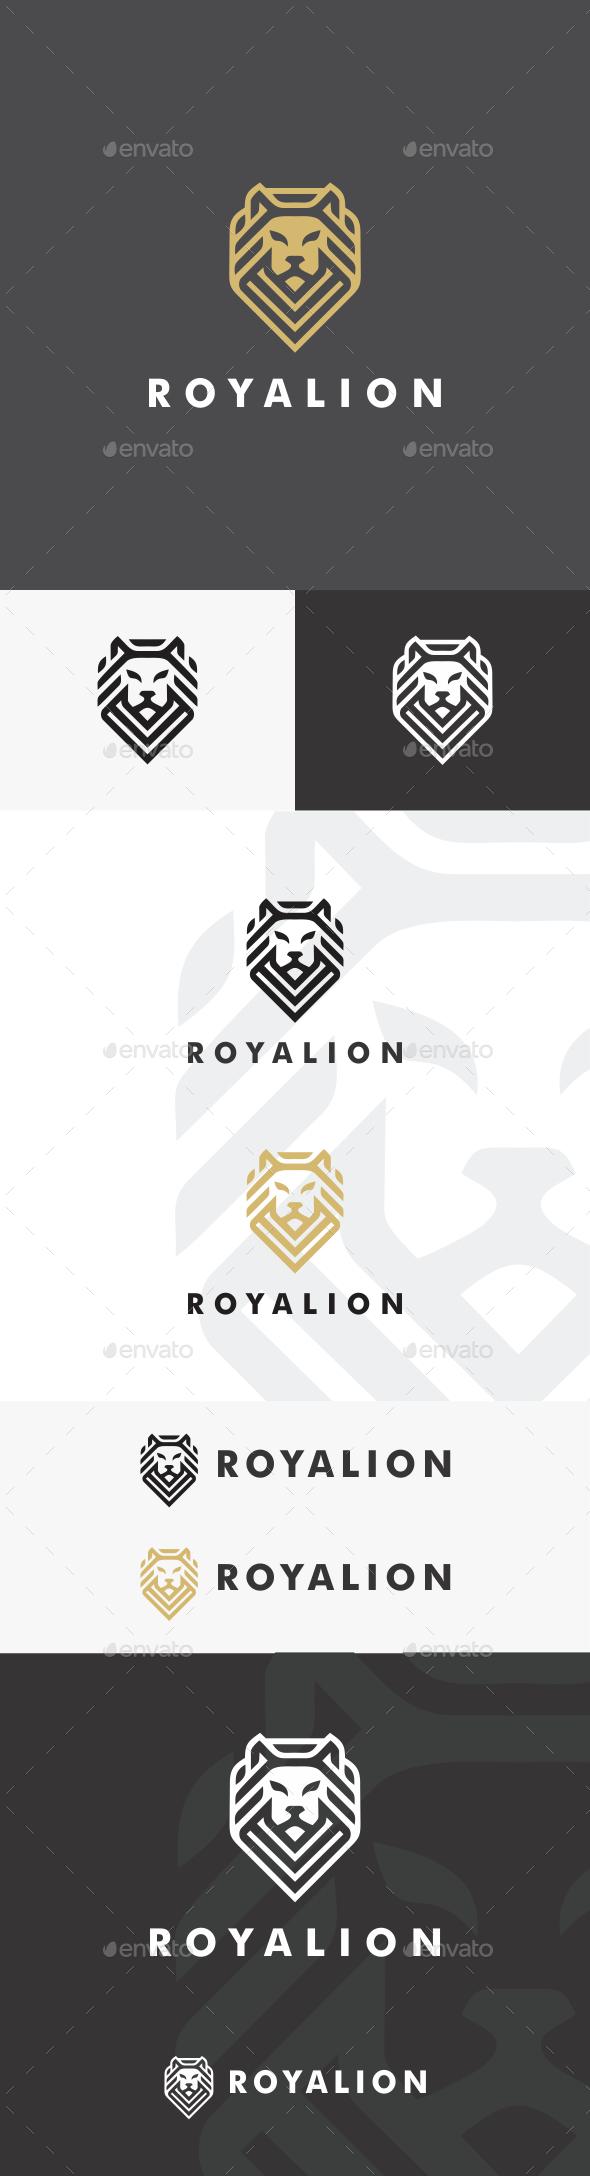 GraphicRiver Royal Lion Logo Template 20334455